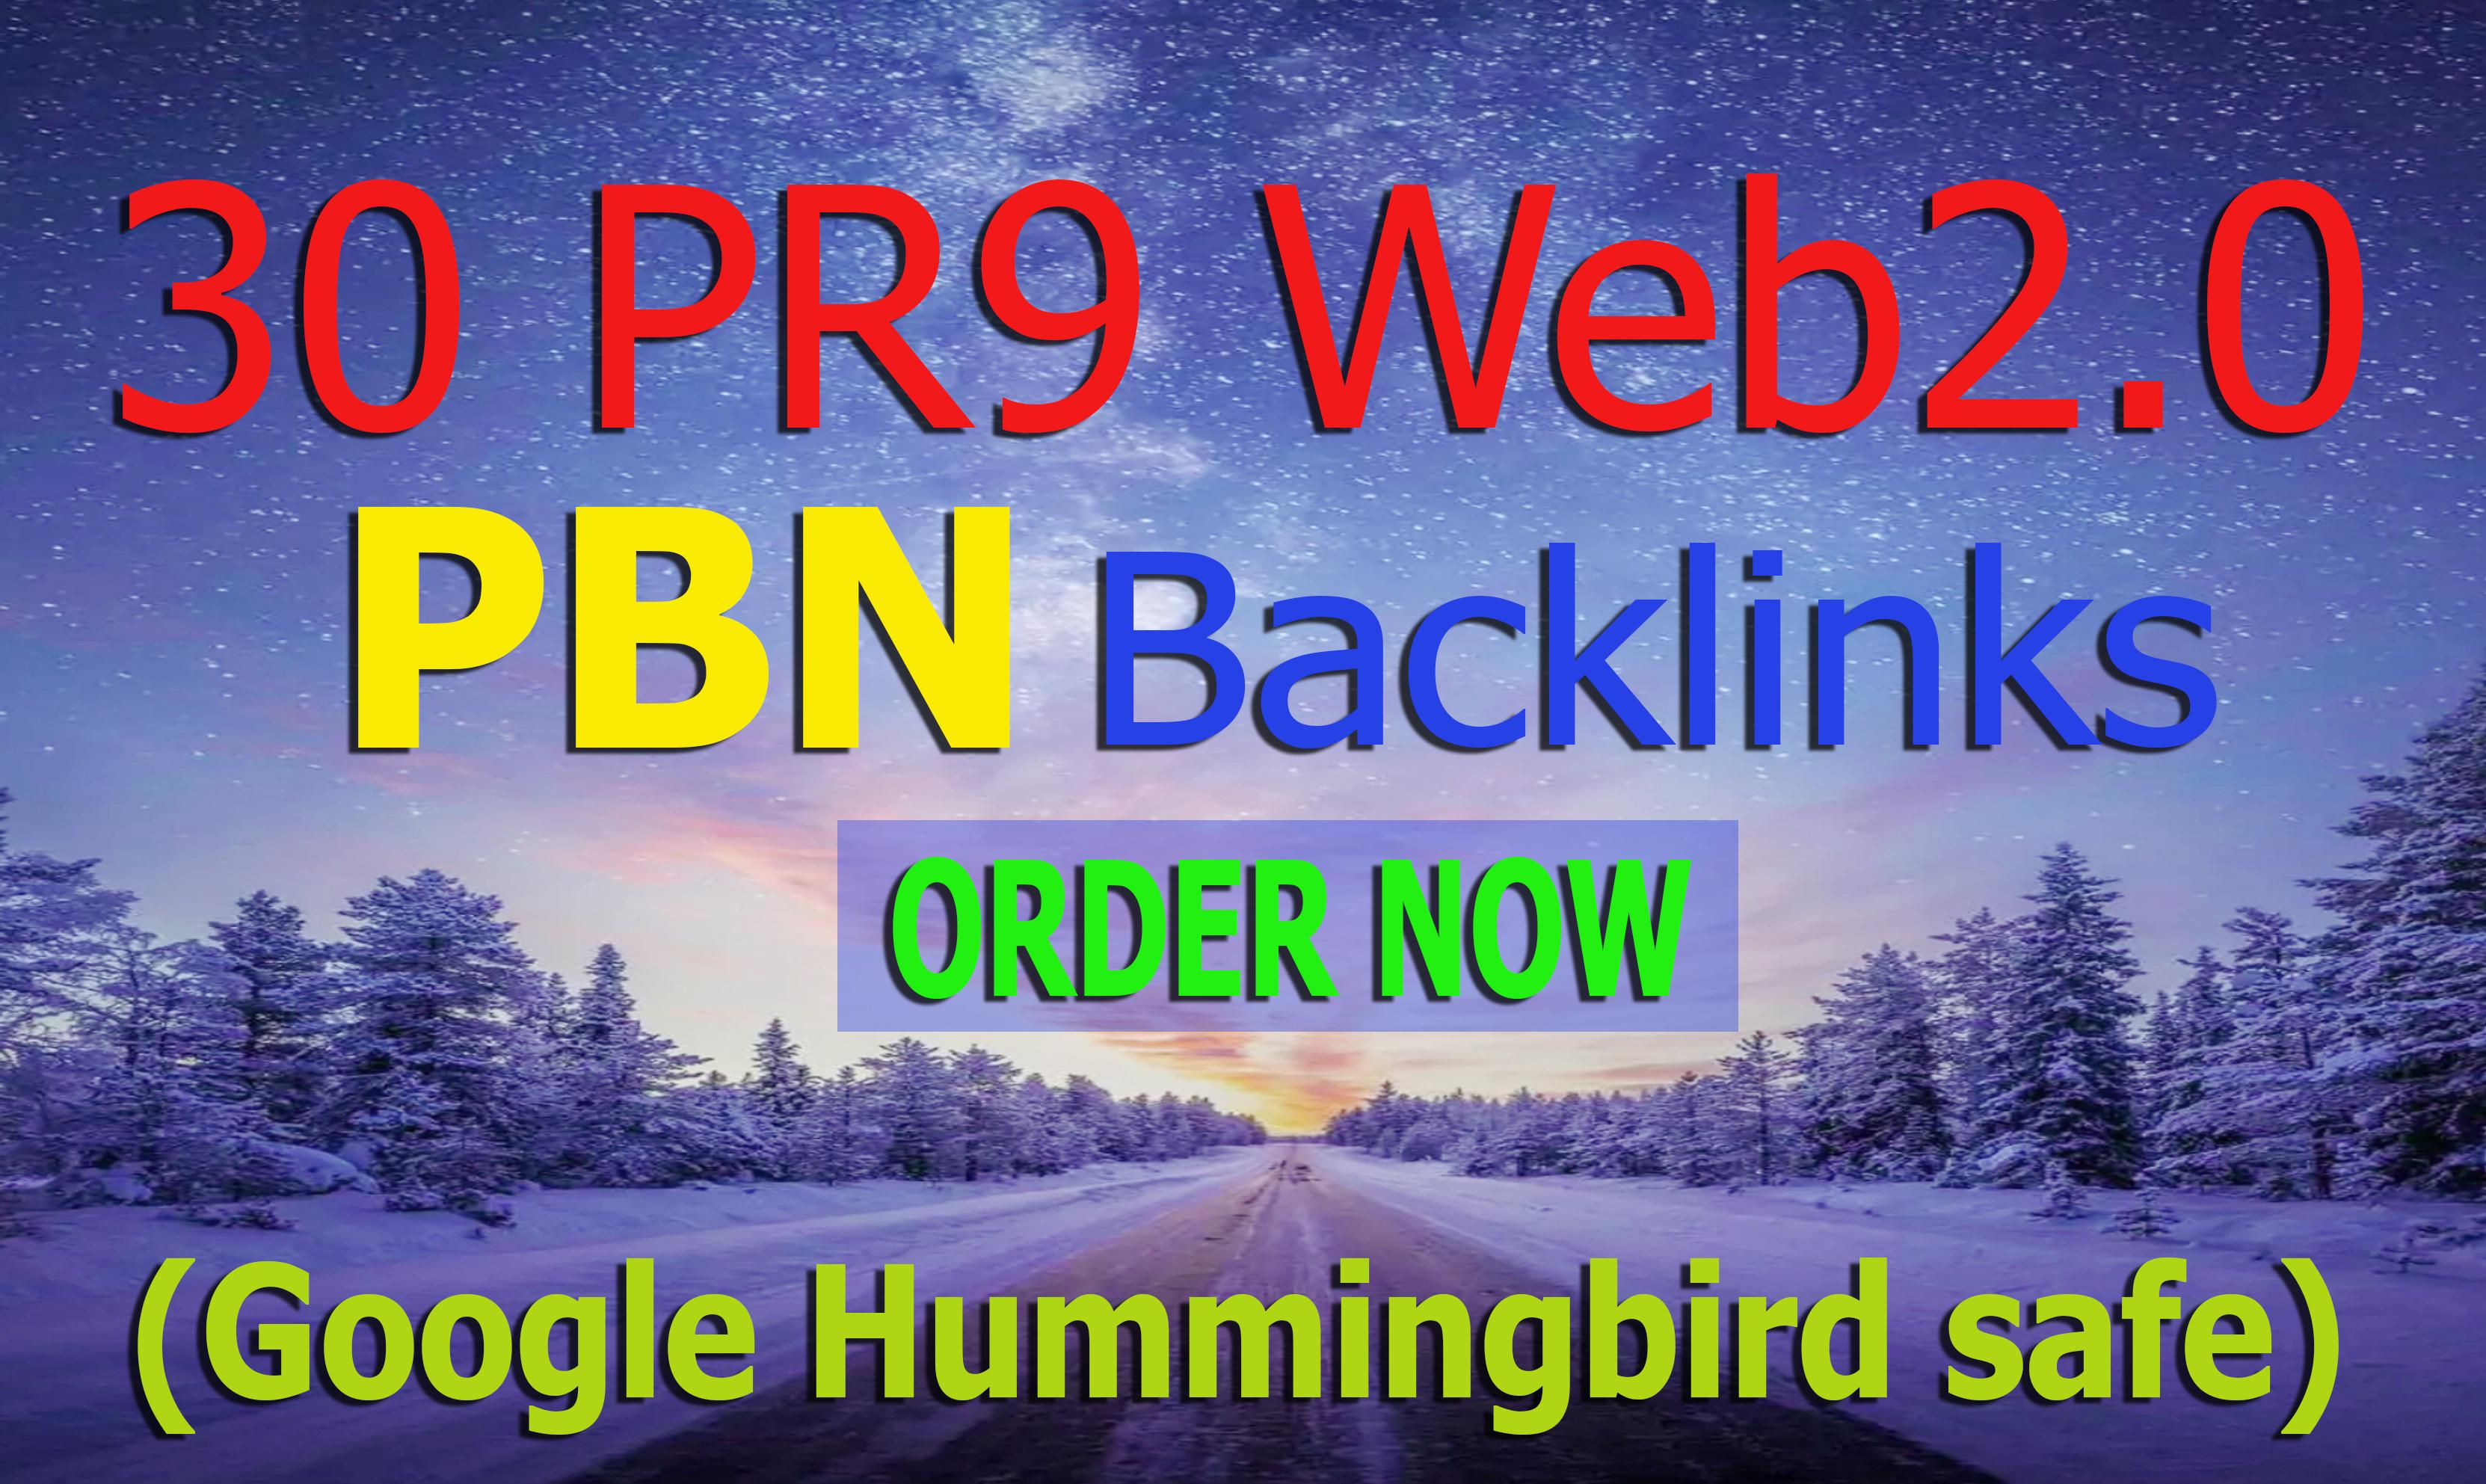 30 Homepage web2.0 PBN Post with High DA PA CF Backlinks